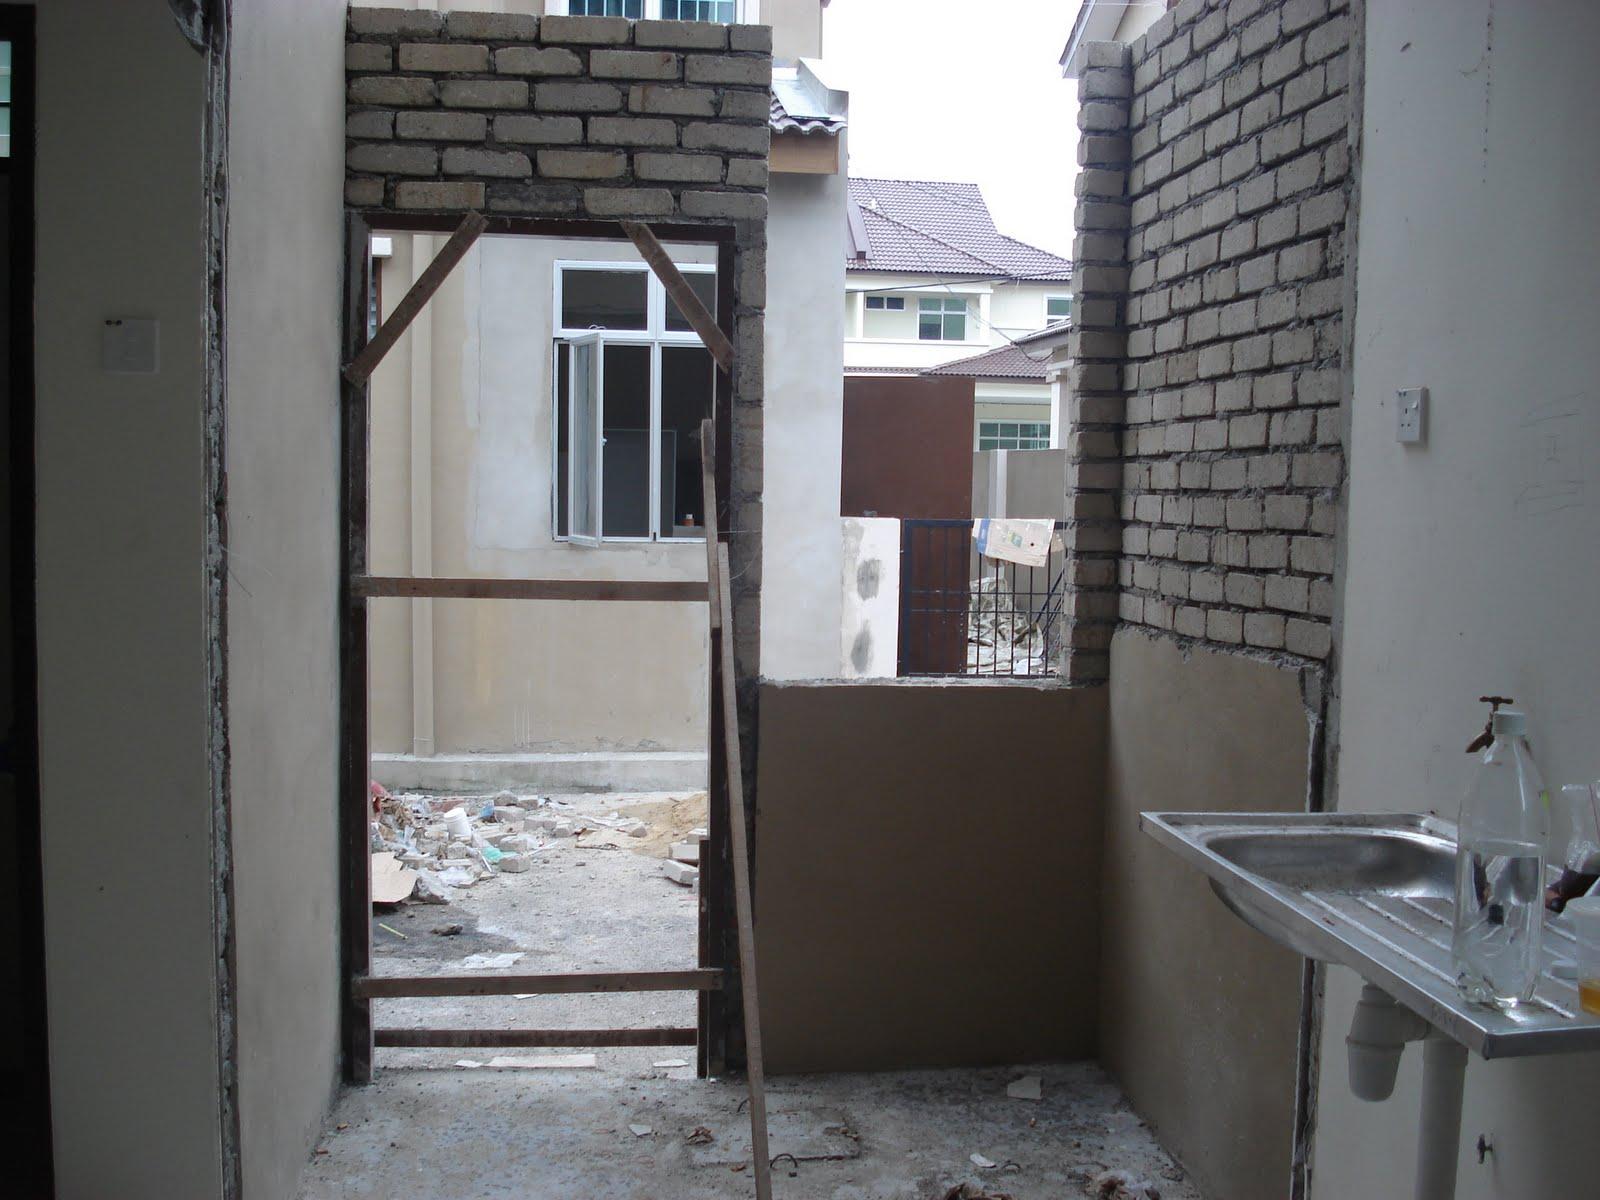 Kemarin Kitorg Pegi Umah Ke Nak Tengok Progress Renovation Dapur Yang Sekangkang Tupai Tu Huhuhu Alhamdulillah Dah Nampak Rupa Dinding Baru Minggu